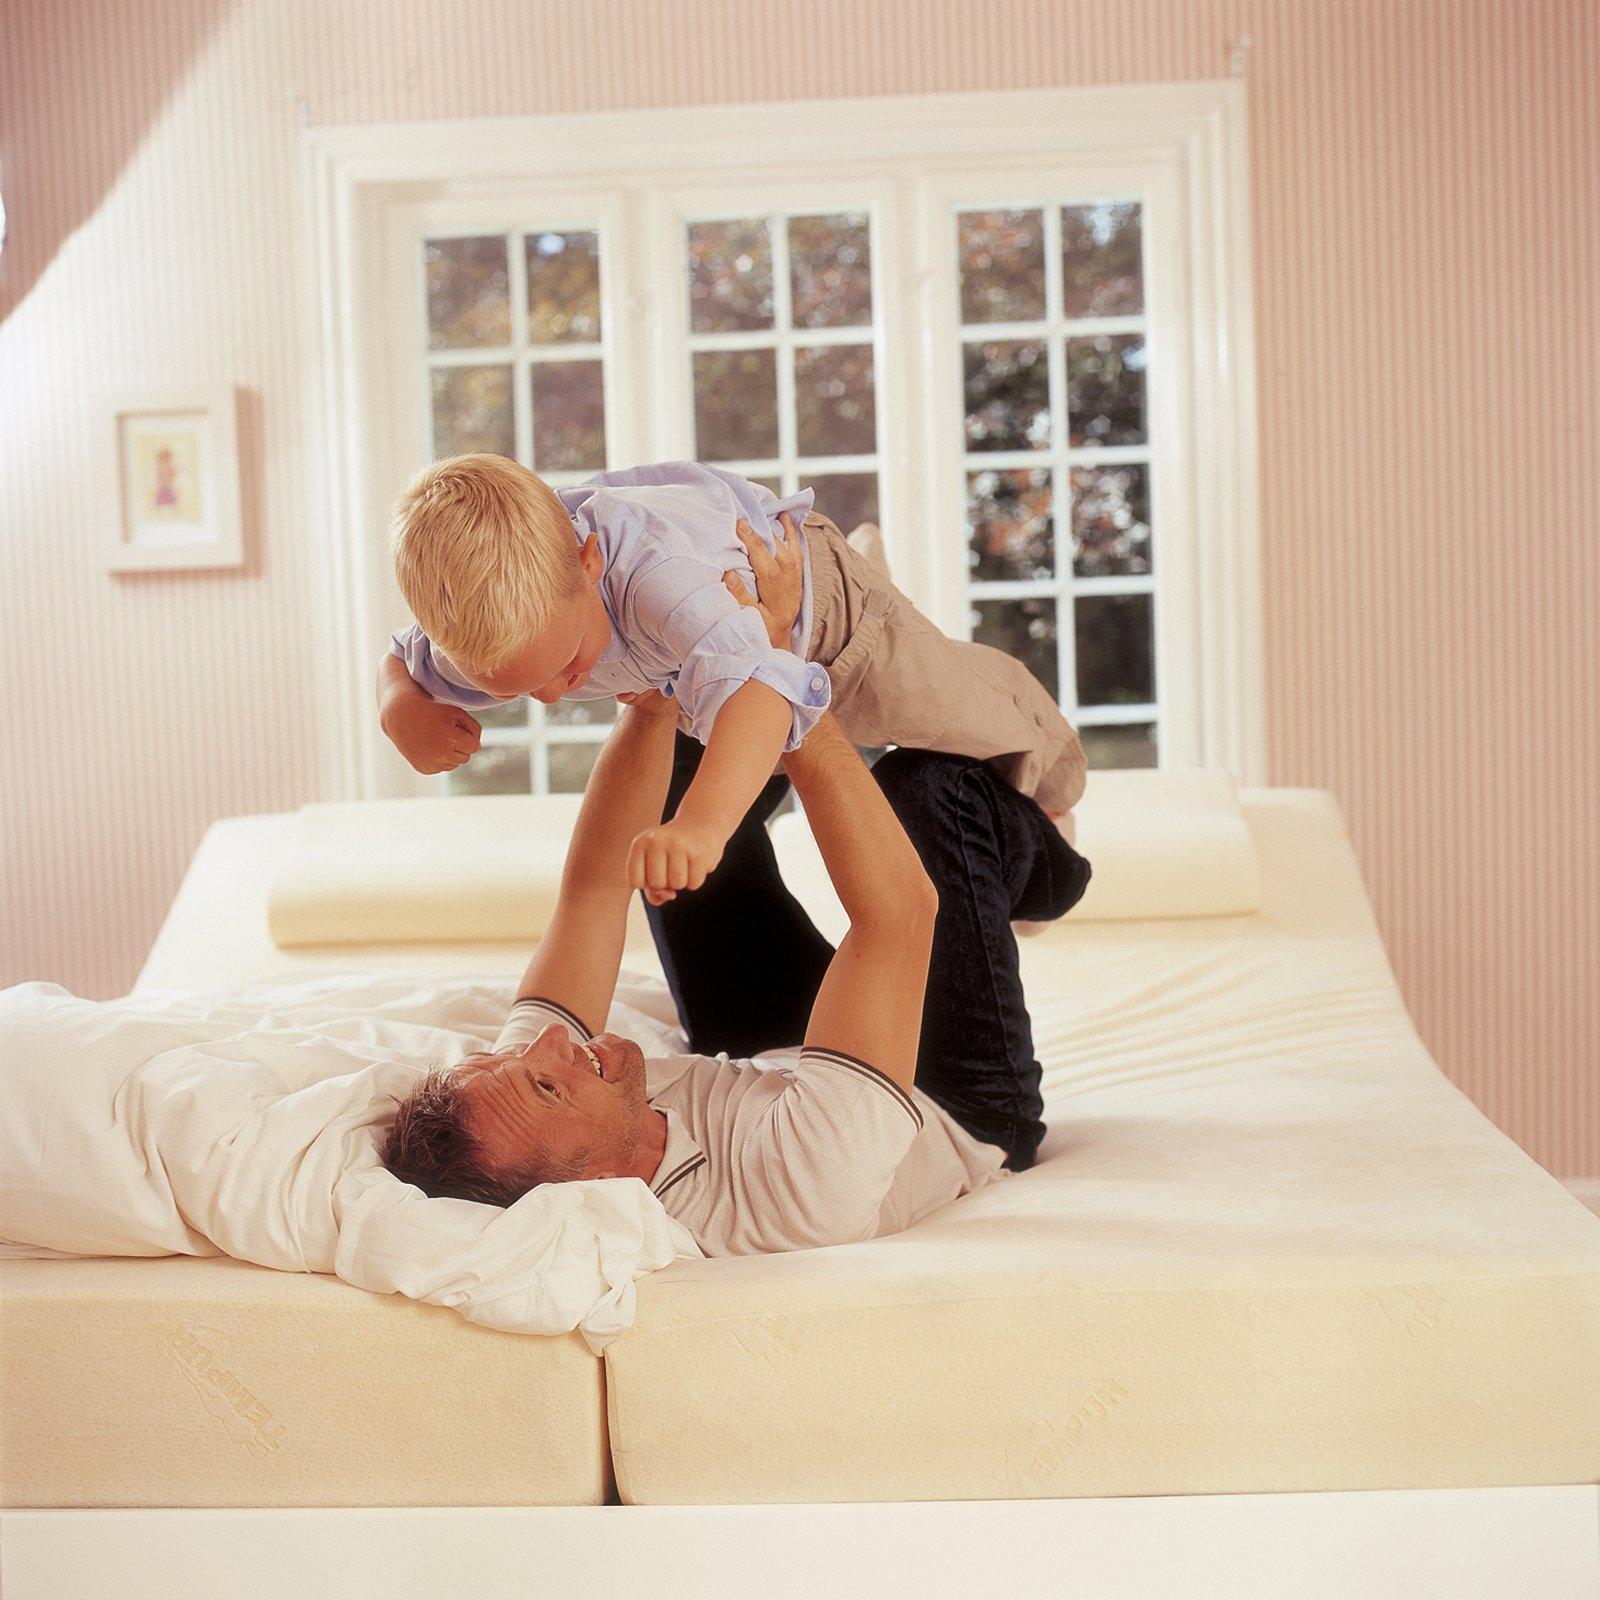 Materassi e cuscini per dormire bene cose di casa for Cuscini tempur